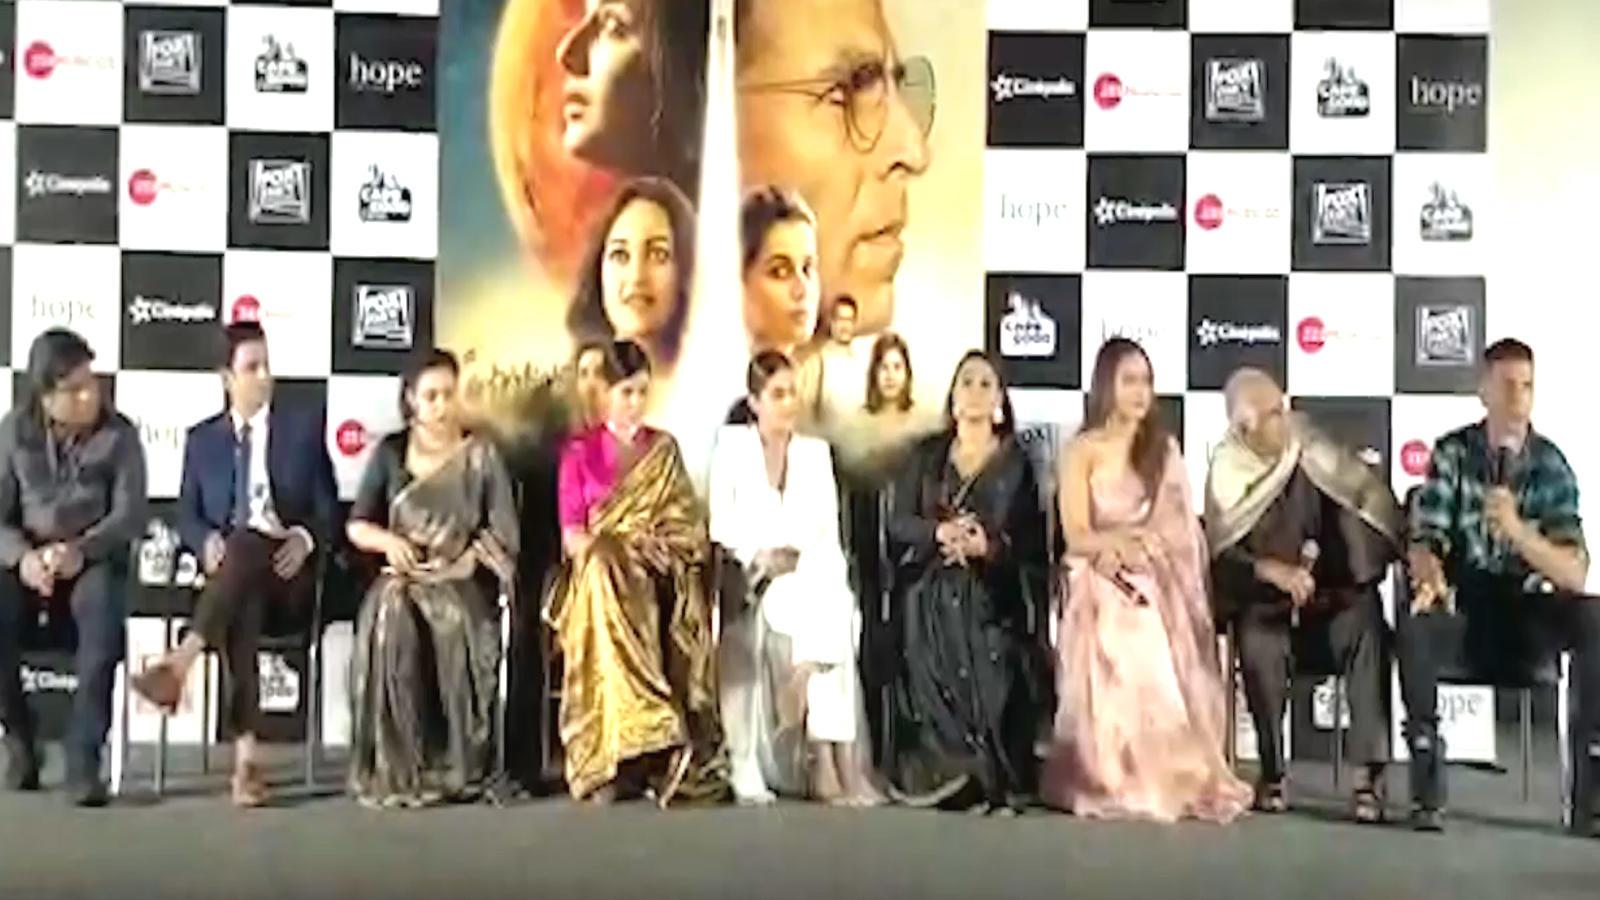 'Mission Mangal': Trailer of Akshay Kumar, Sonakshi Sinha and Vidya Balan starrer is out